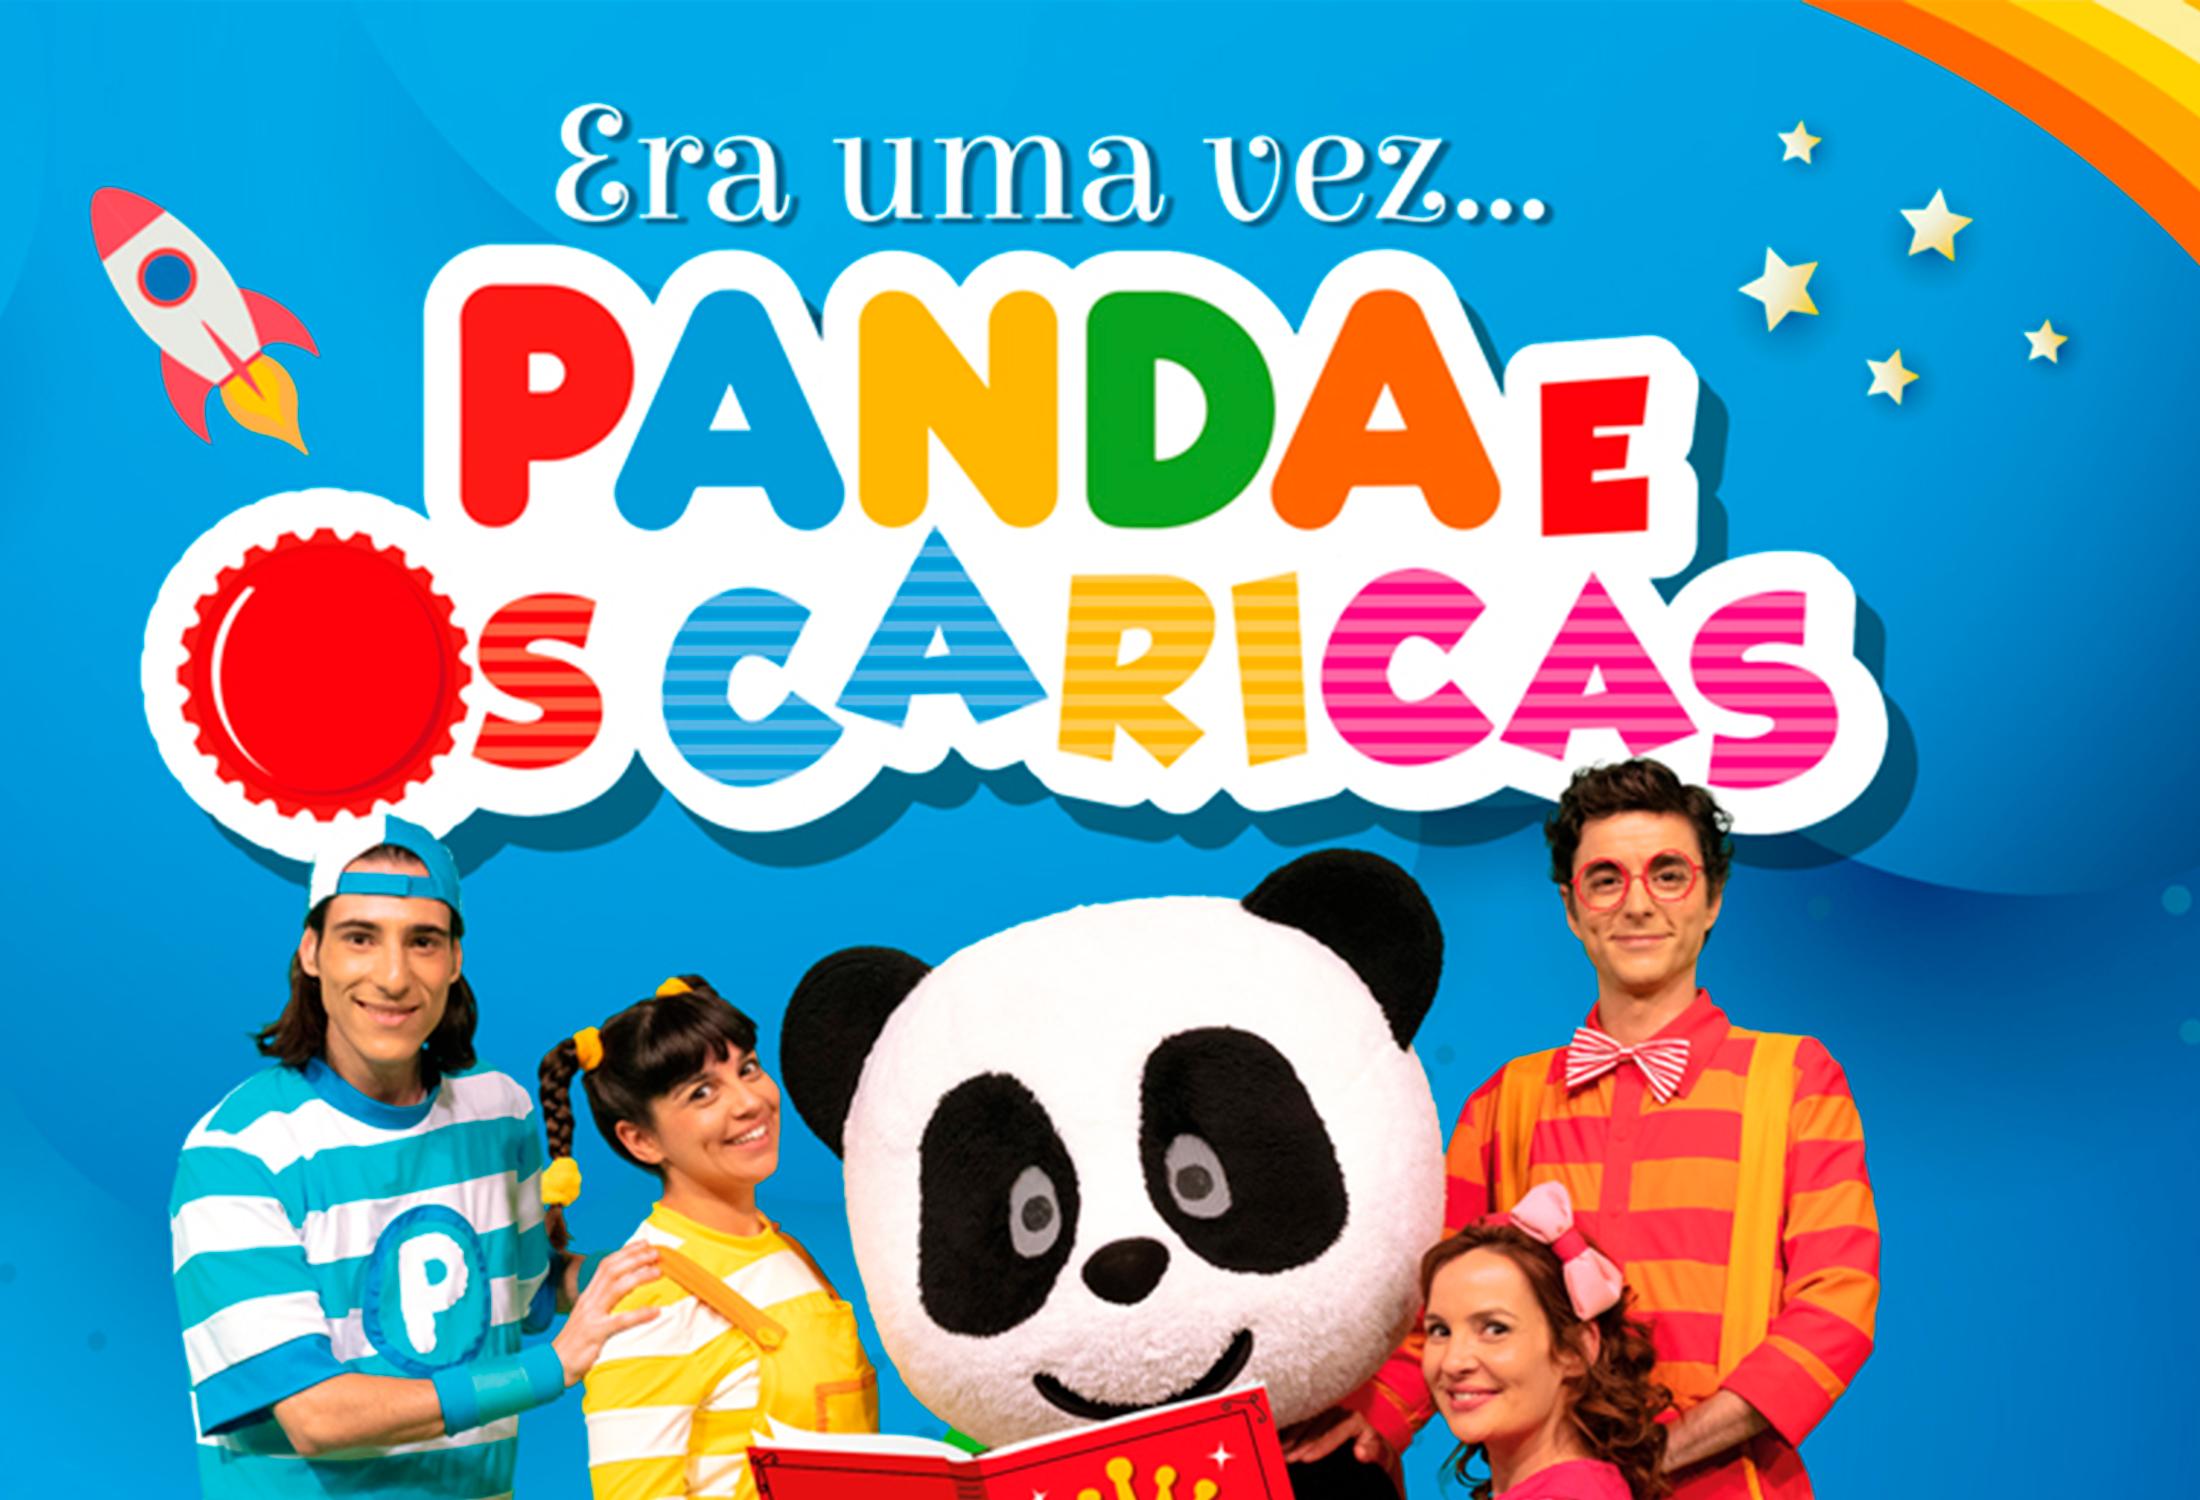 MUSICAL PANDA E OS CARICAS 2019